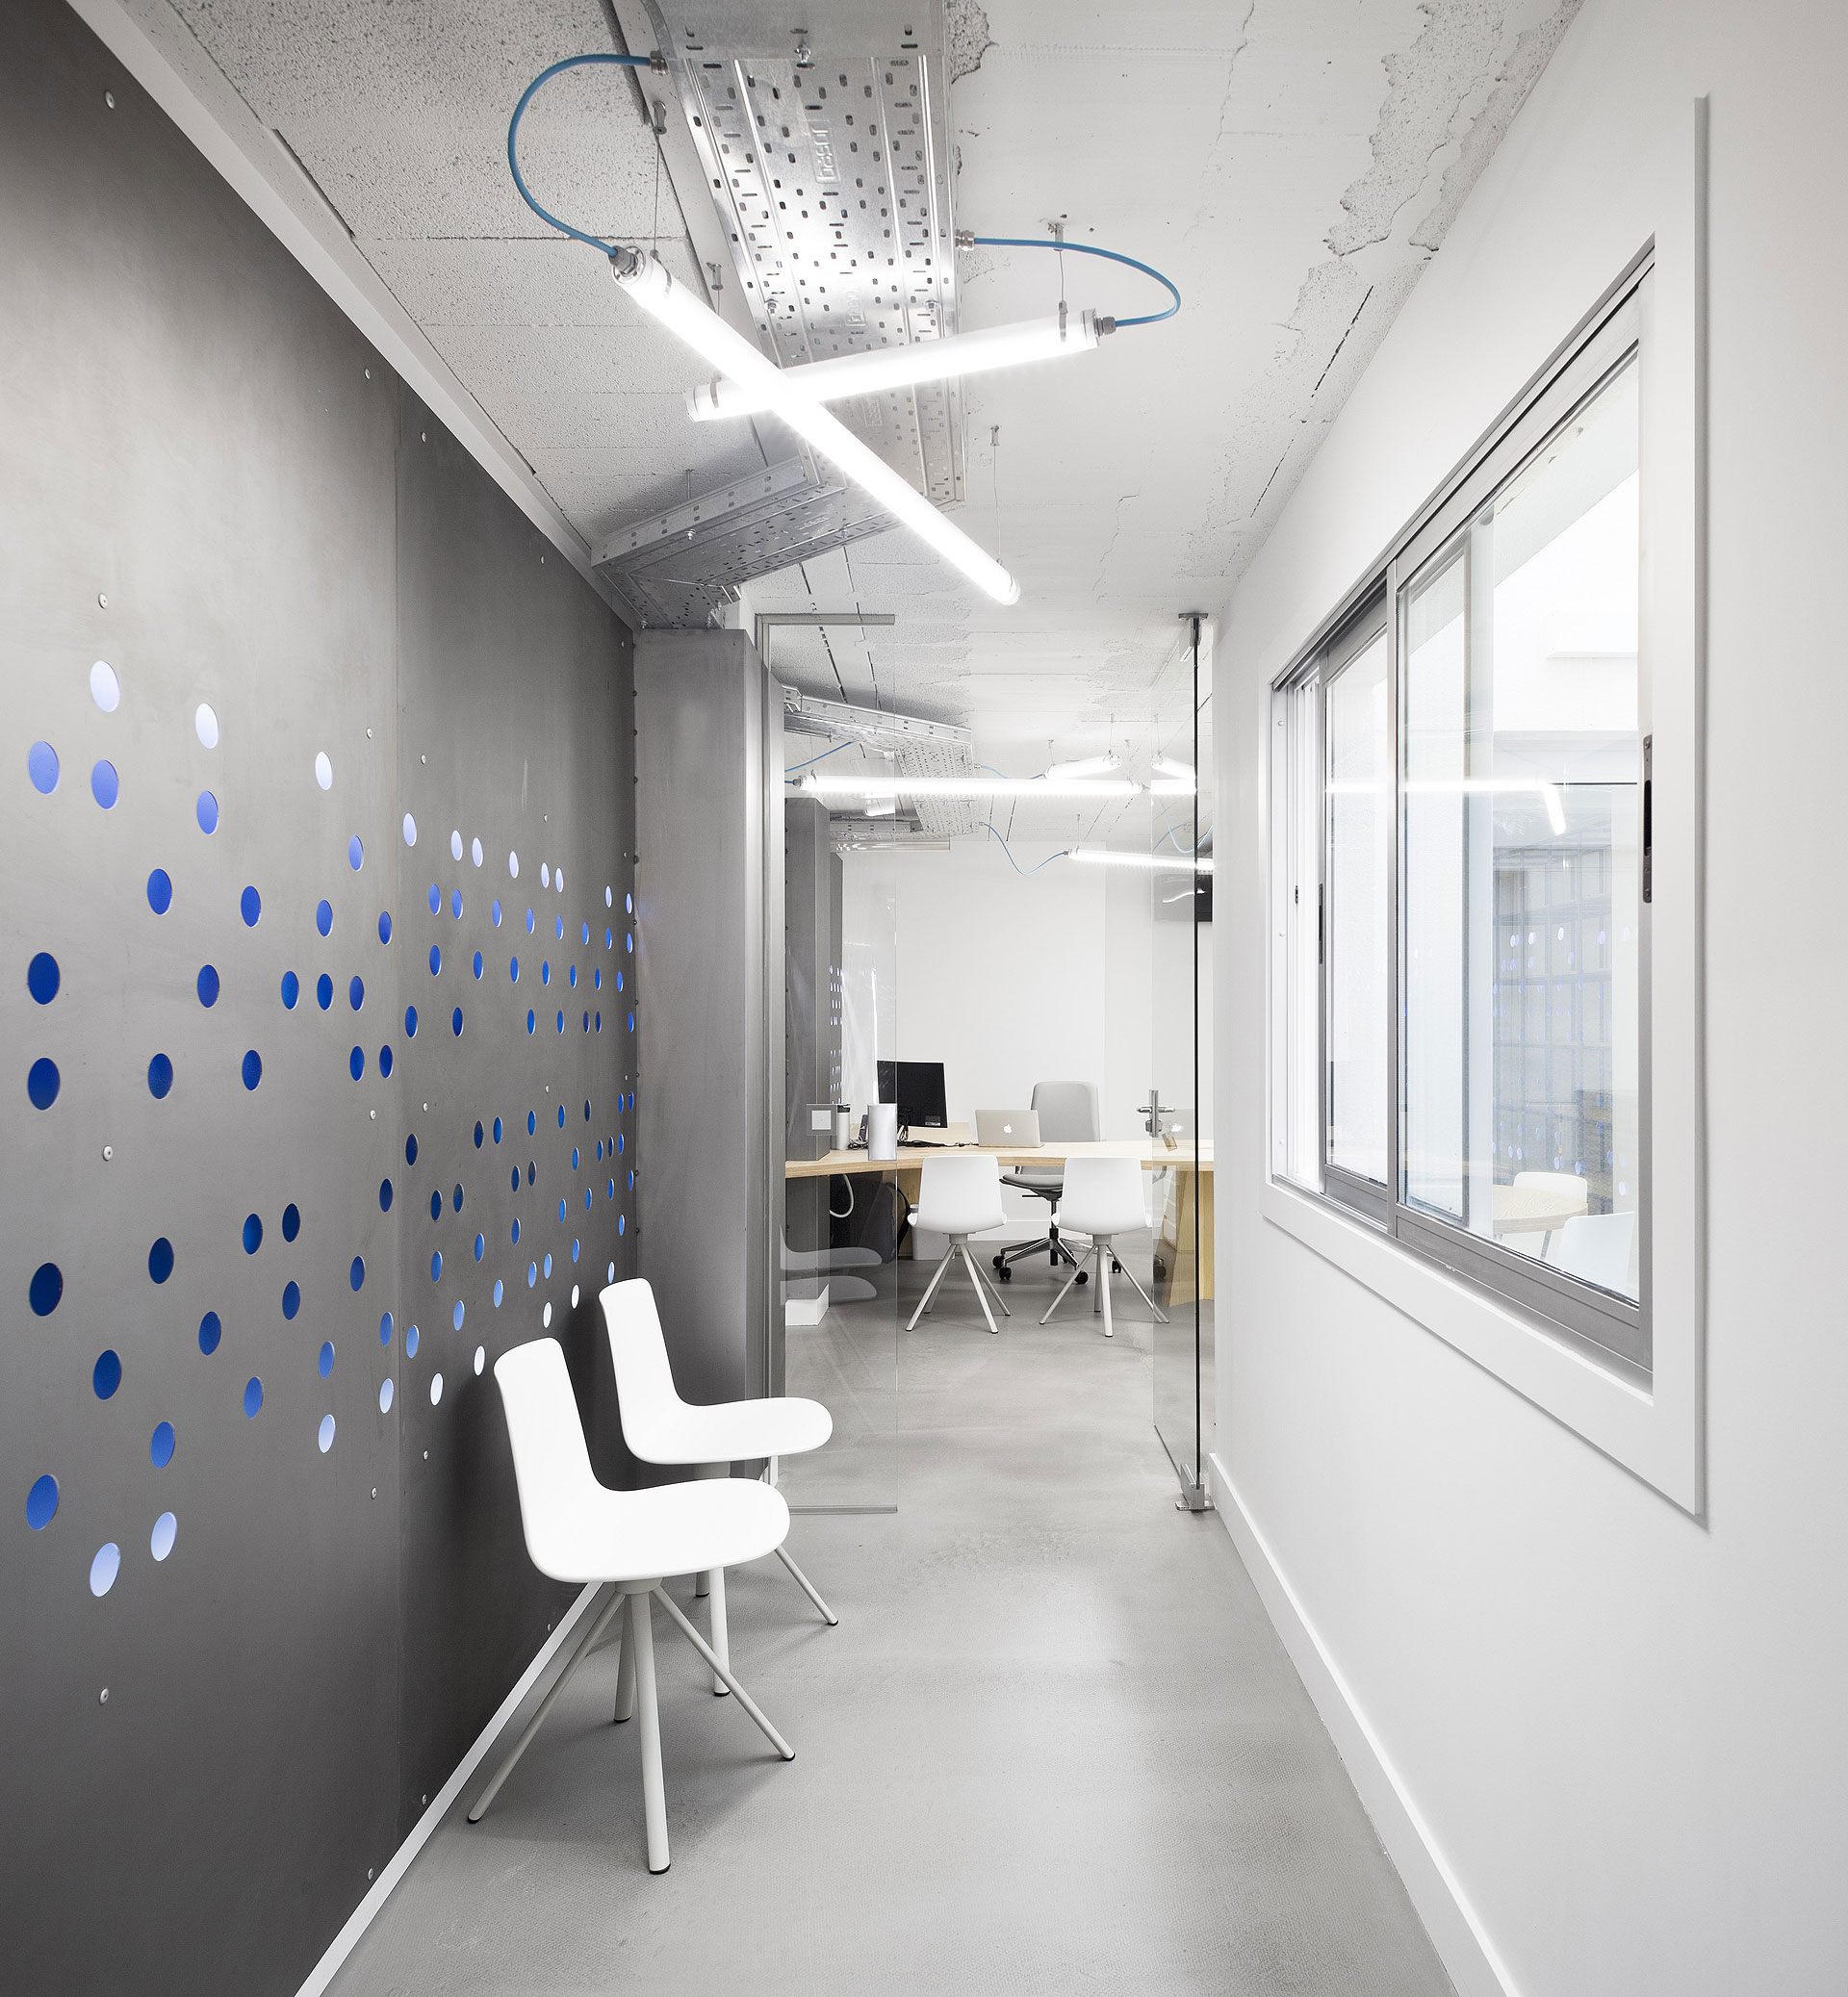 oficinas ineltron de as-built - foto roi alonso (0)